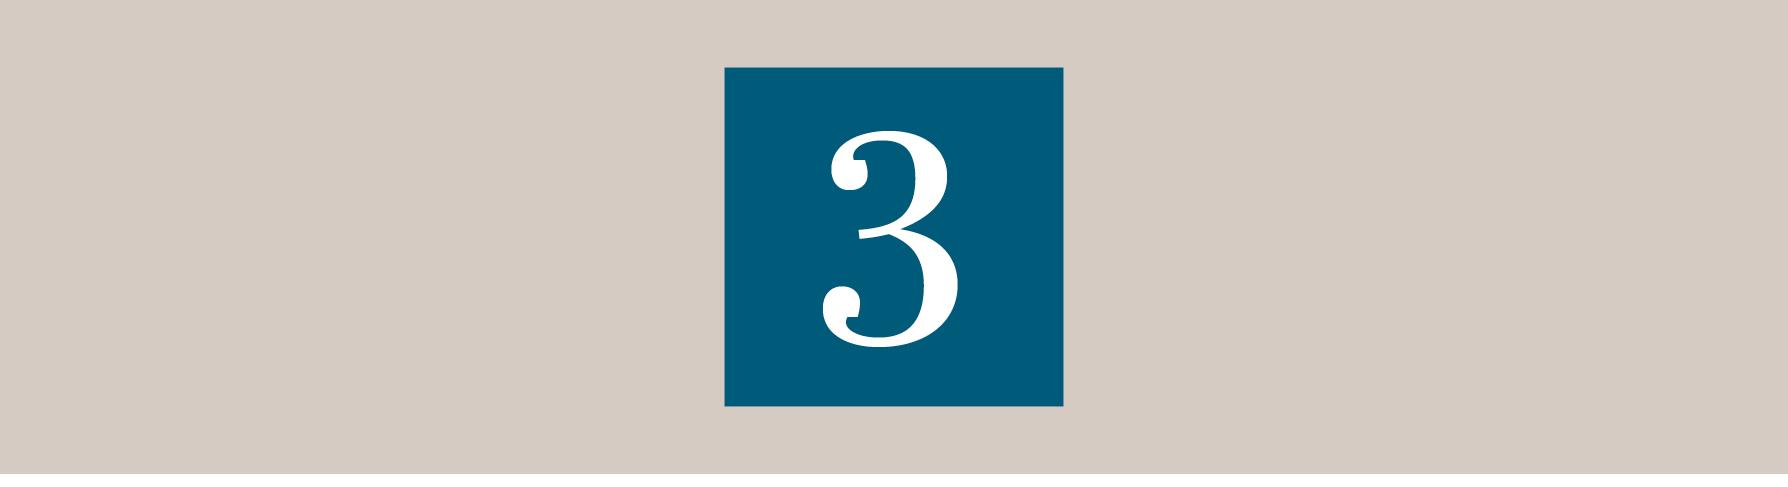 module 3 - validation